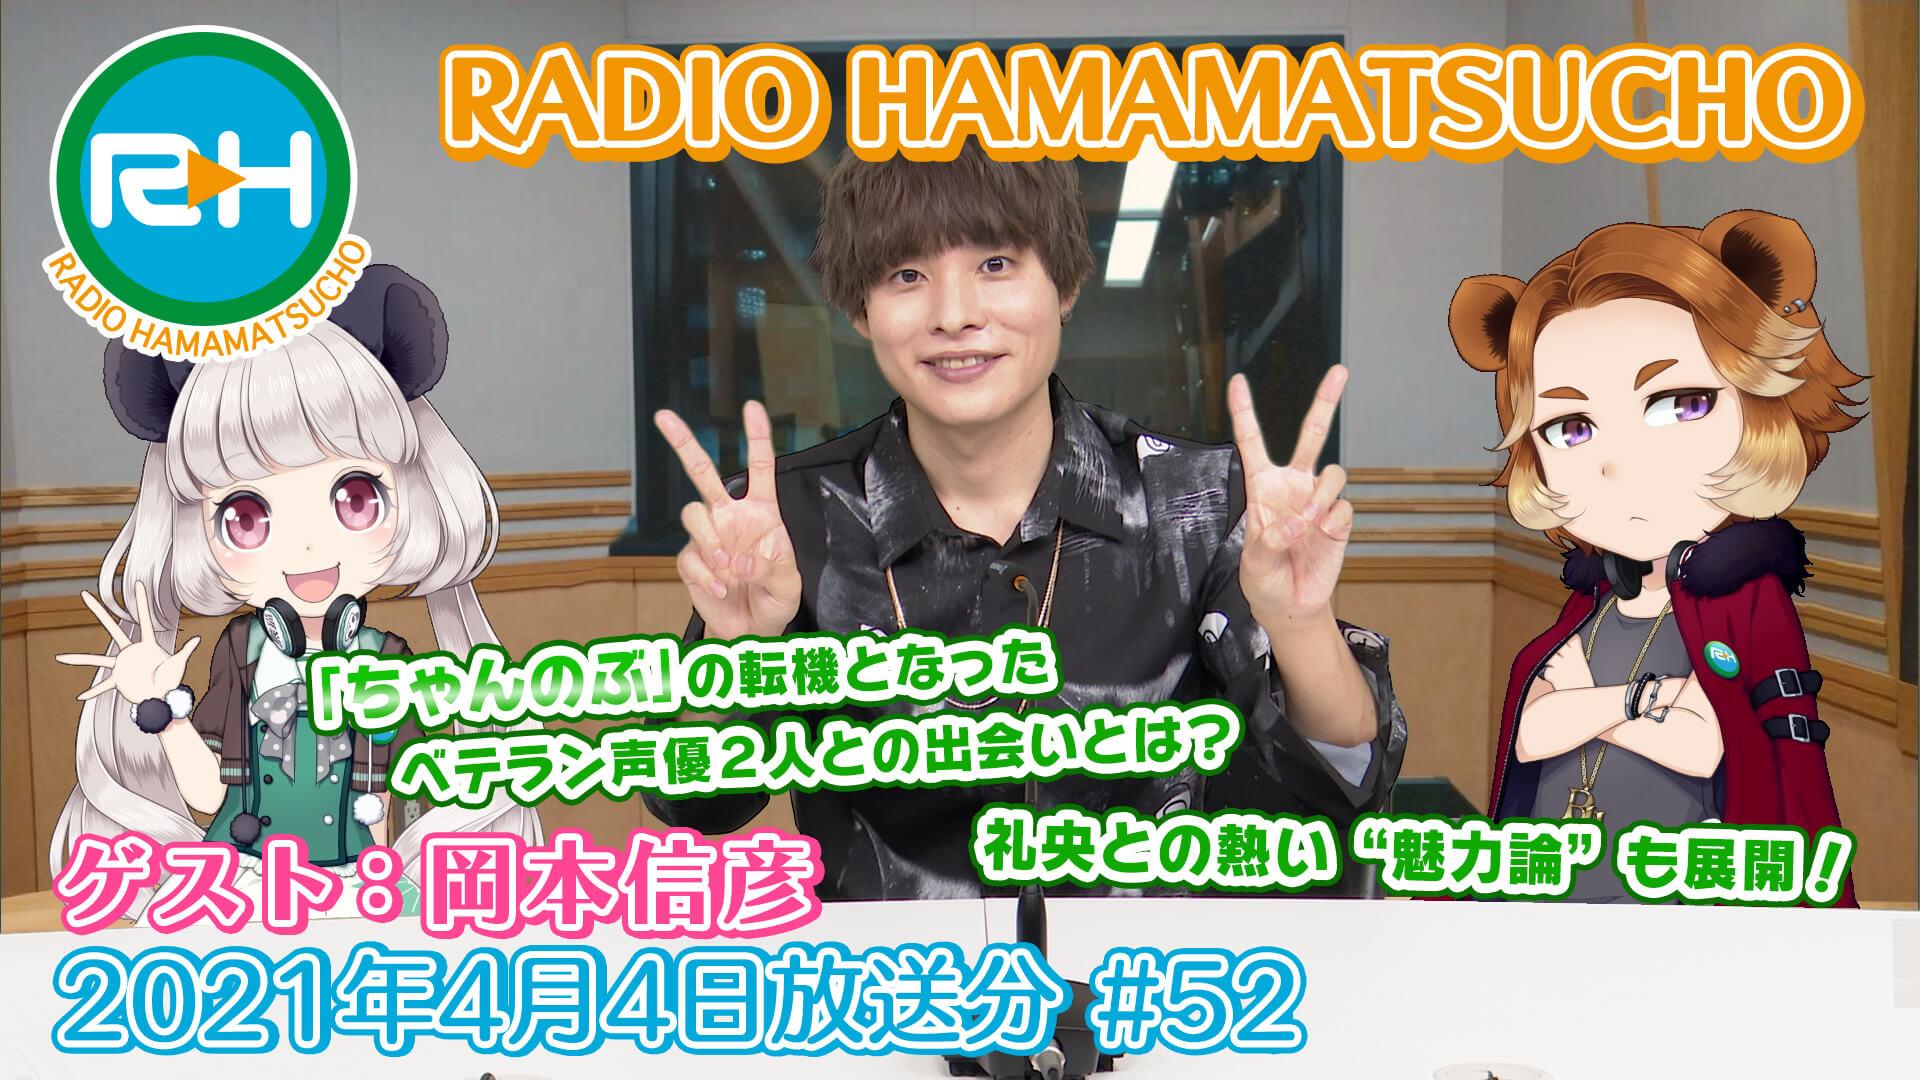 RADIO HAMAMATSUCHO 第52回 (2021年4月4日放送分) ゲスト: 岡本信彦